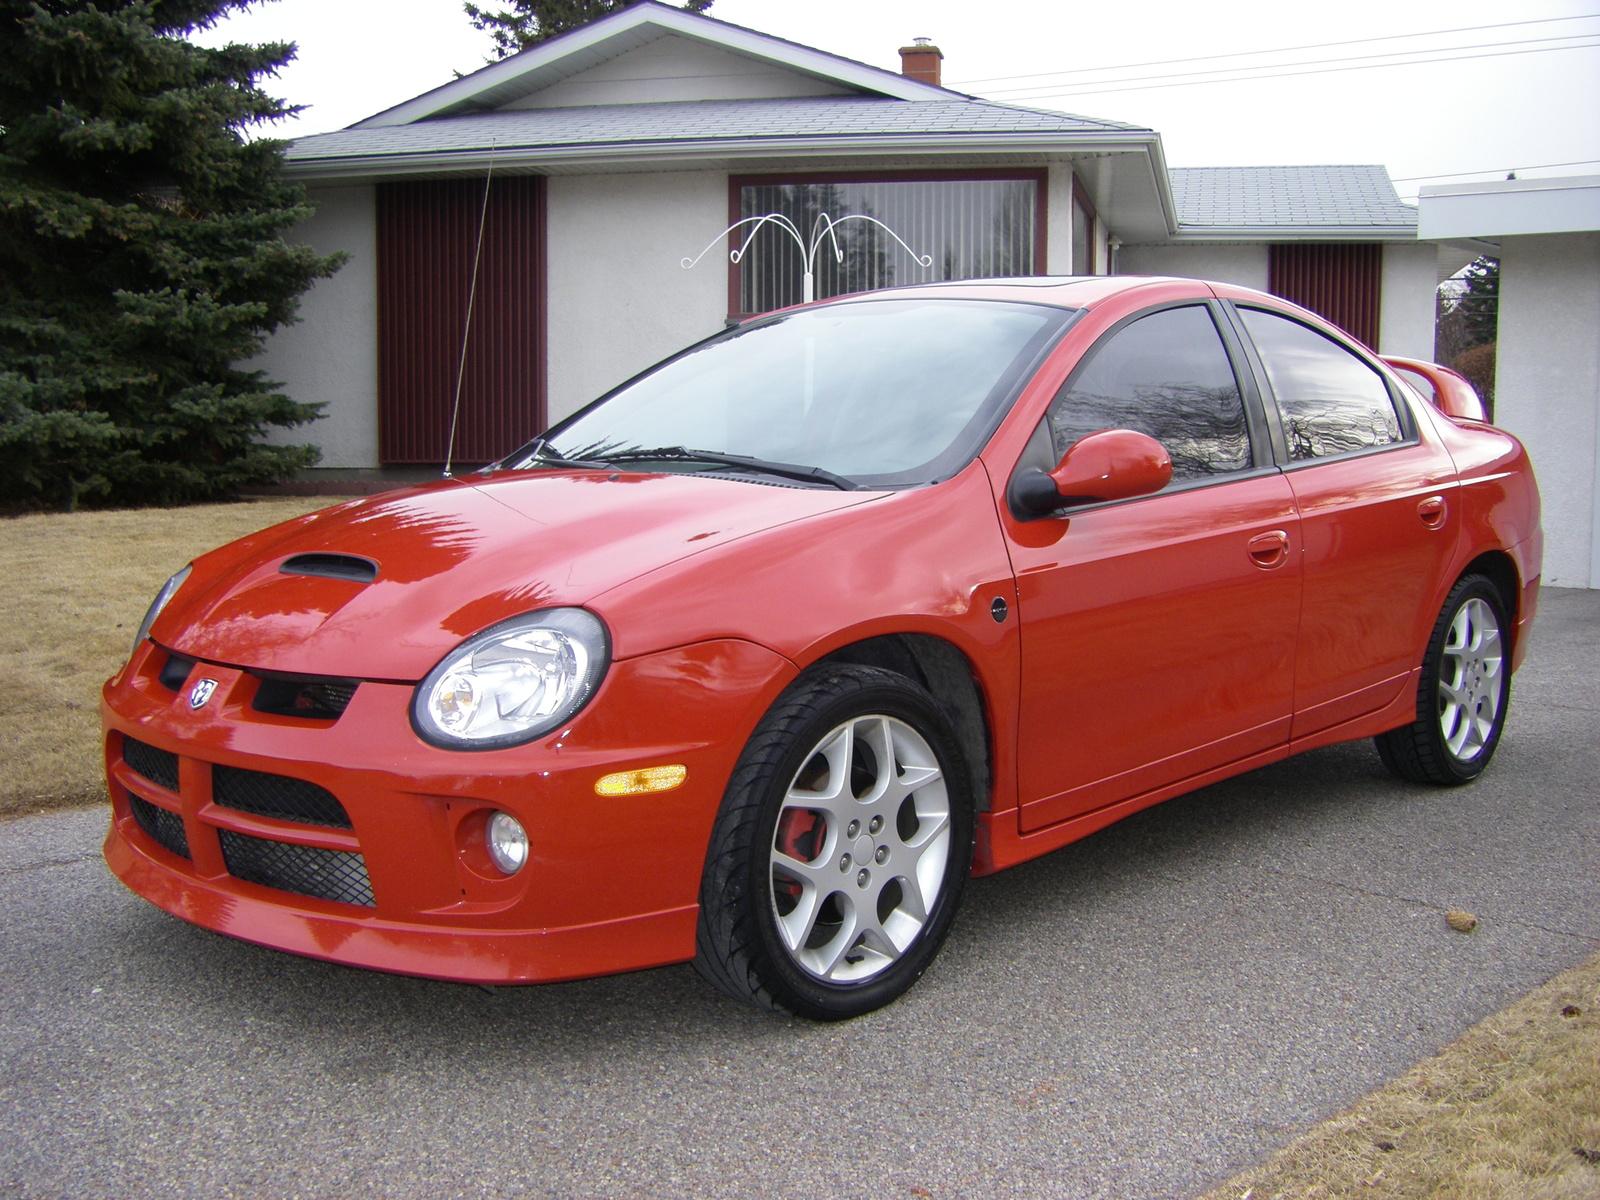 Picture of 2004 Dodge Neon SRT-4 4 Dr Turbo Sedan